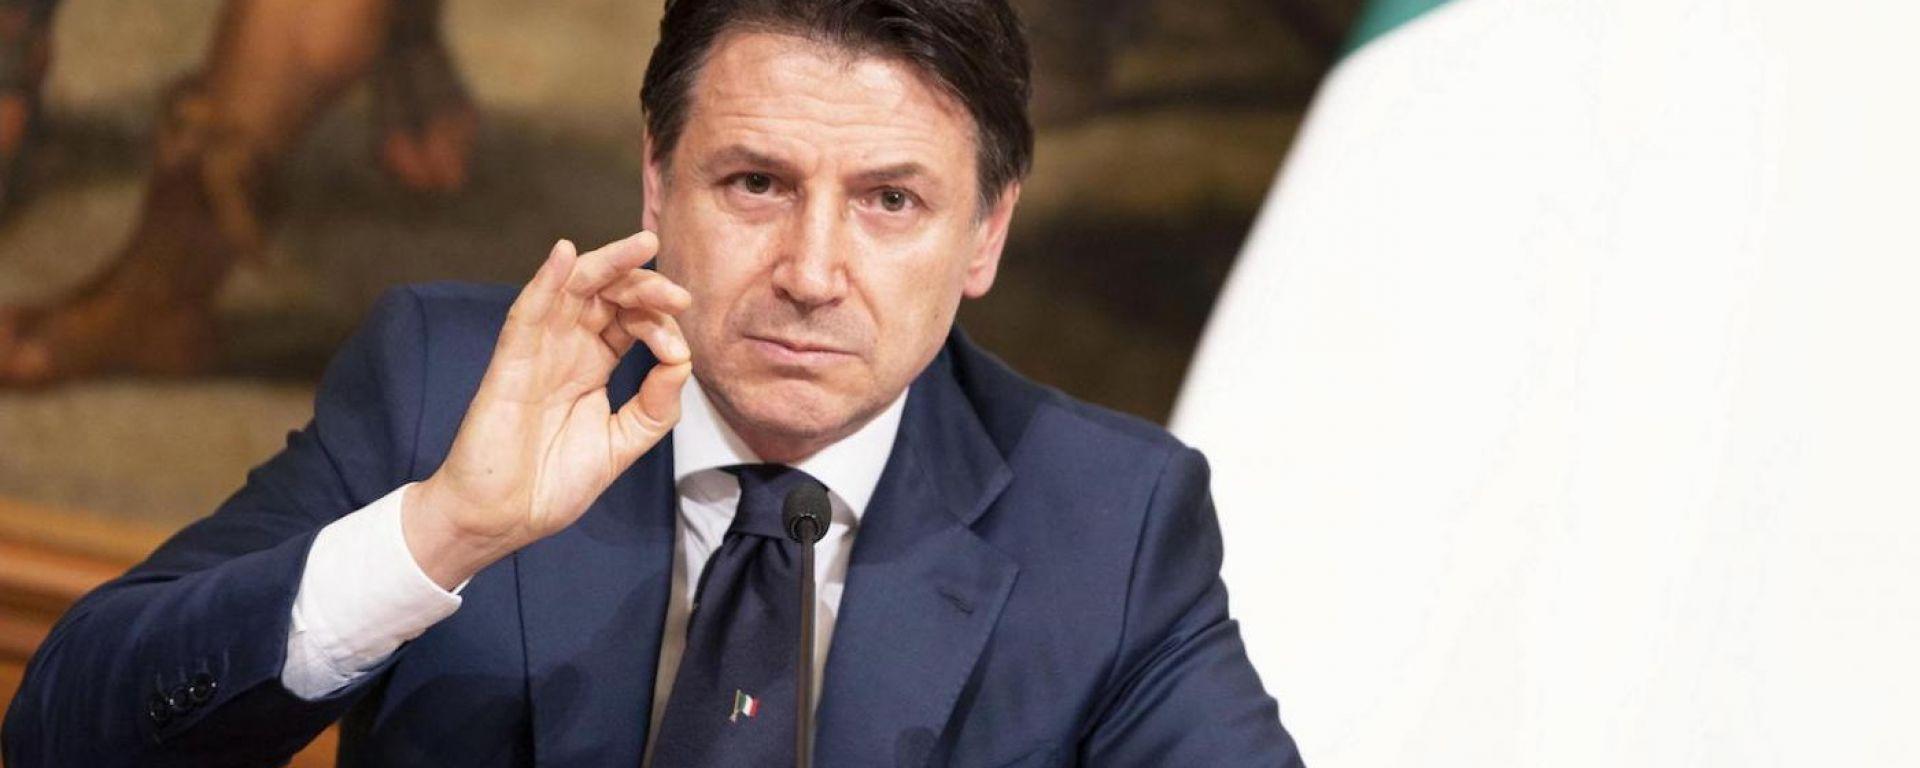 Decreto Rilancio, 100 milioni per l'ecobonus ma...